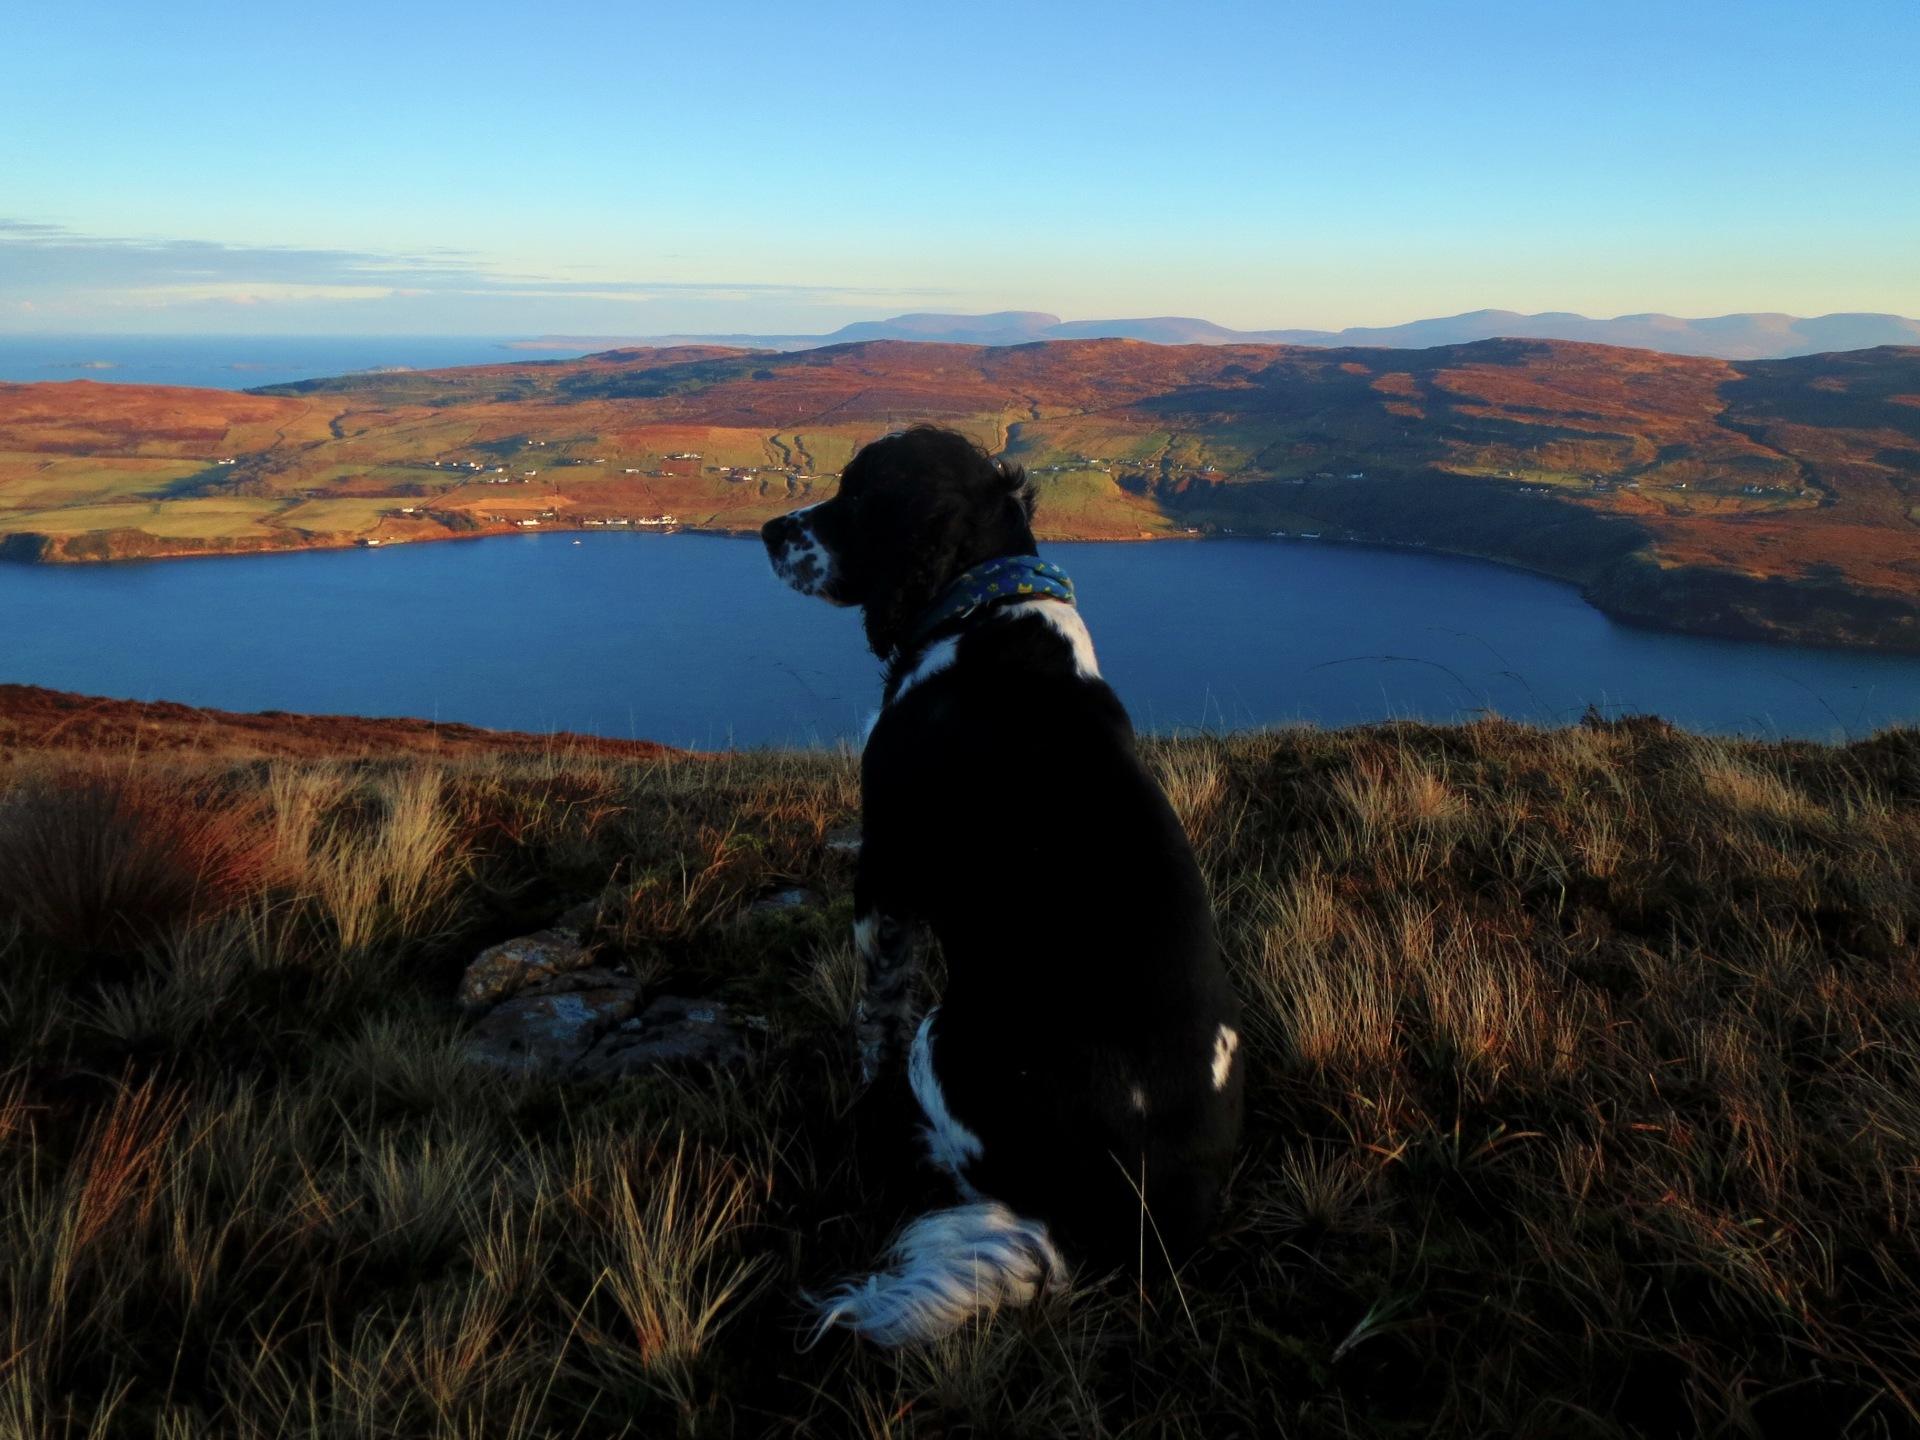 Rhumdog on top of the world